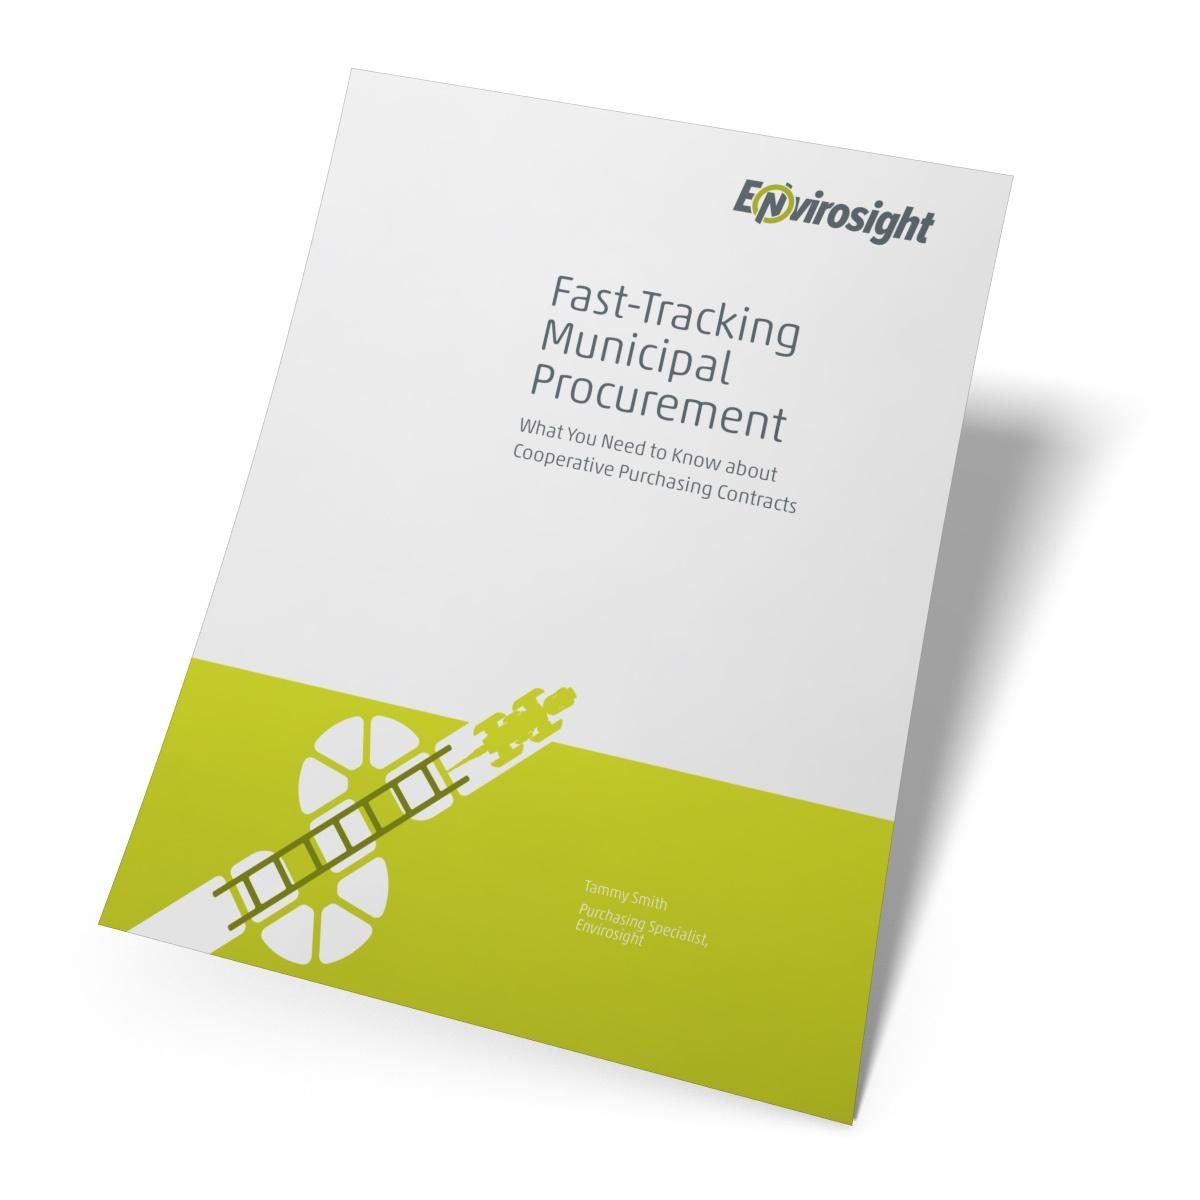 Fast-Tracking Municipal Procurement